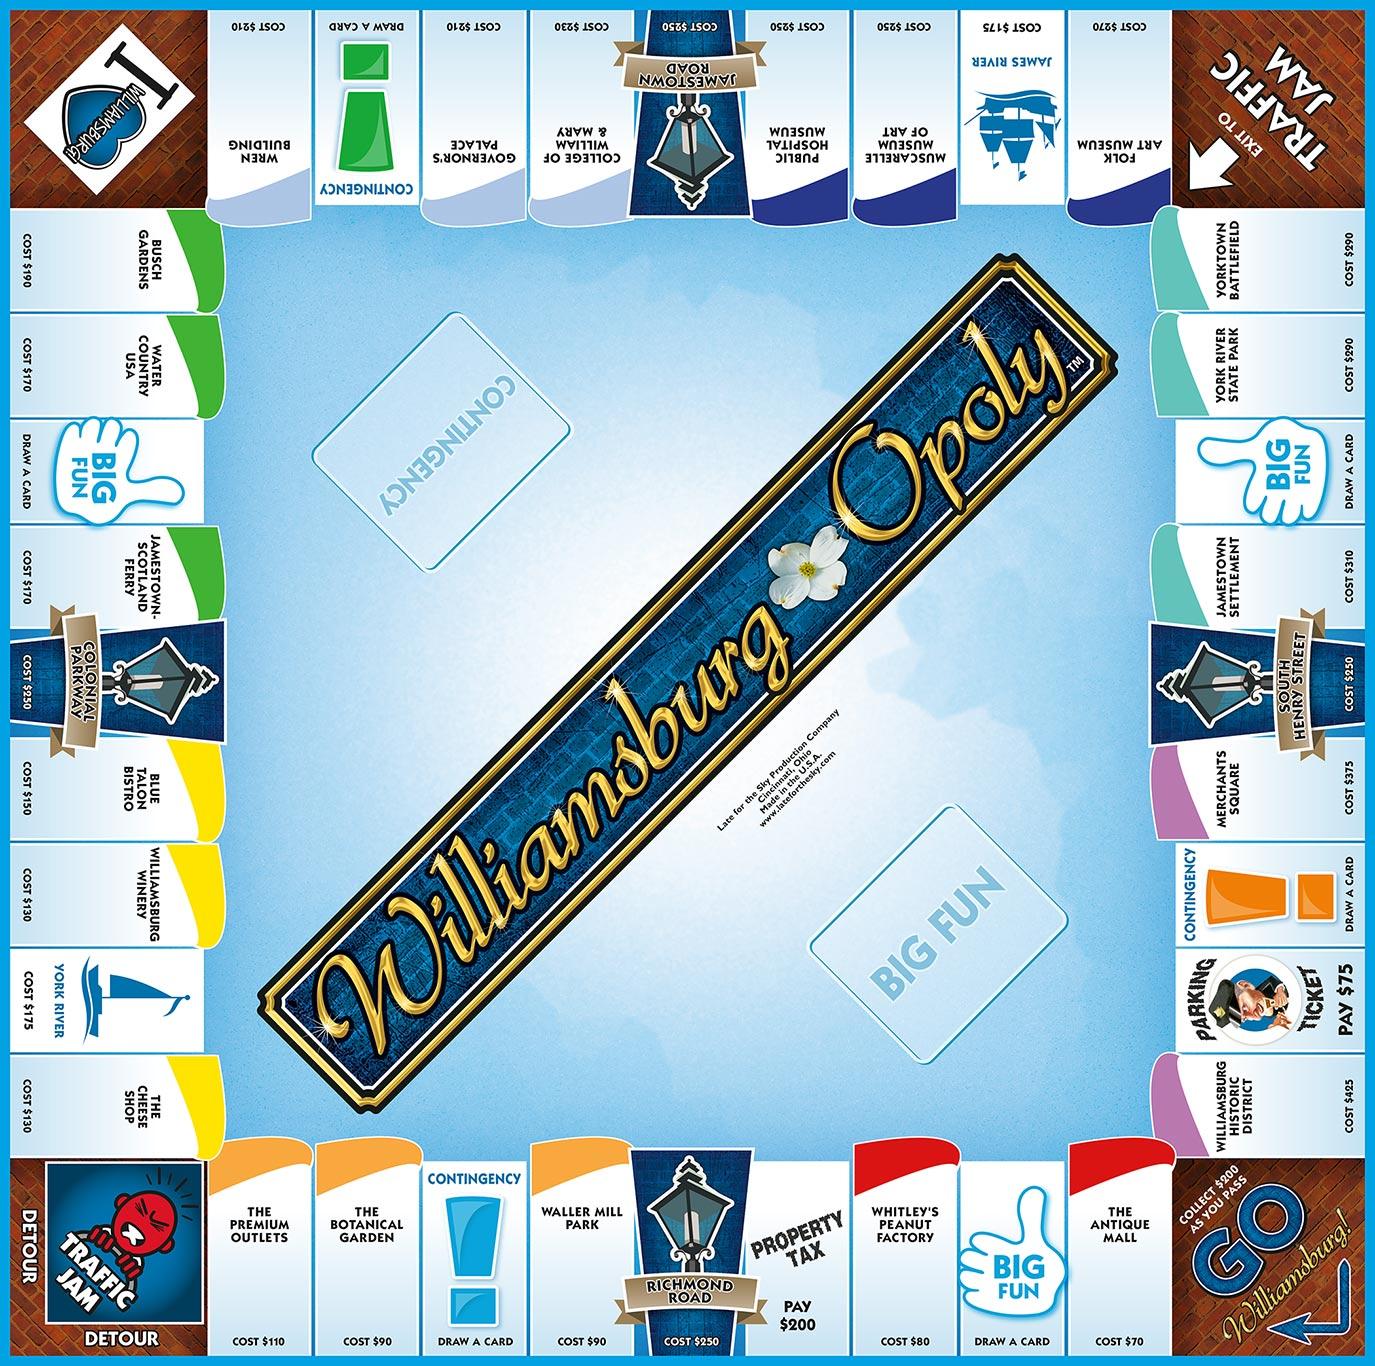 WILLIAMSBURG-OPOLY Board Game